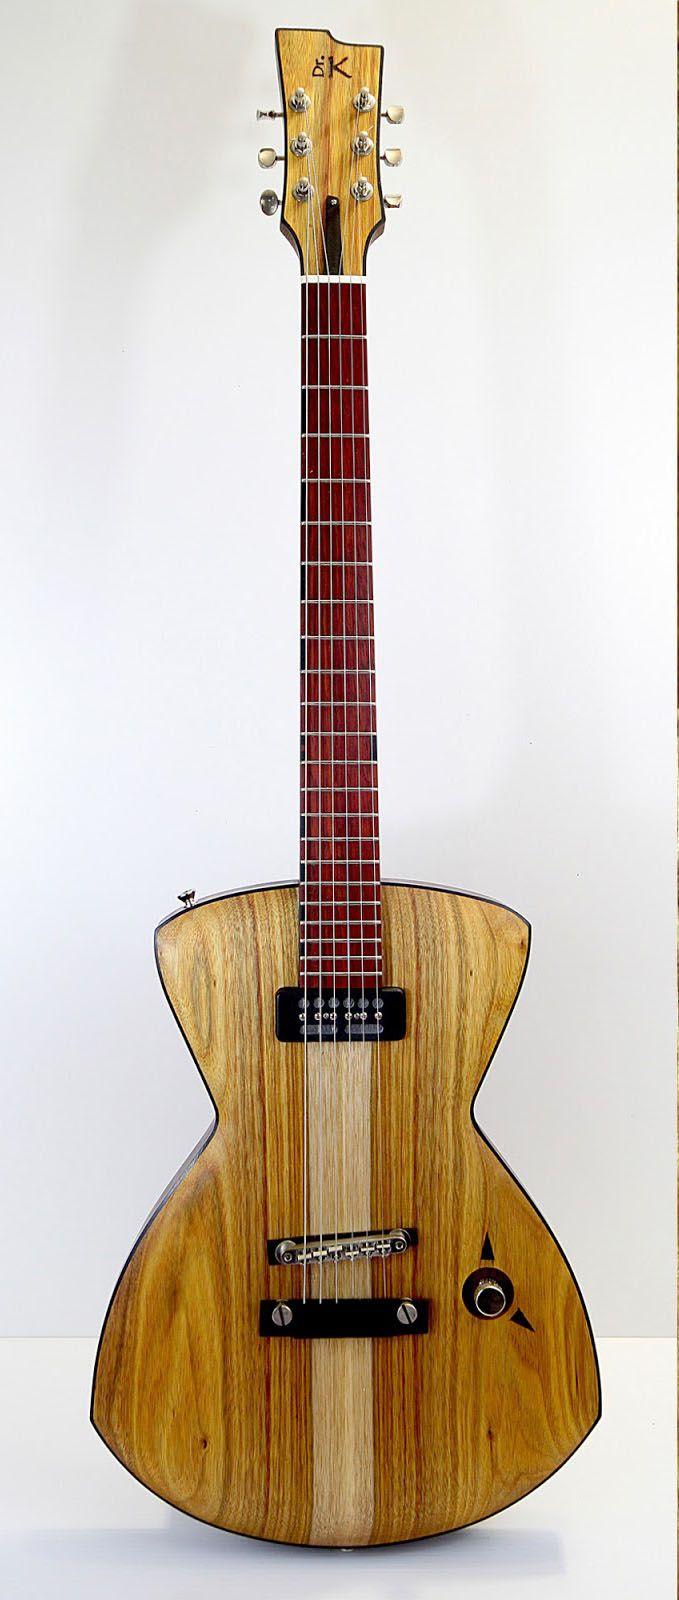 Dr K S Exoti K1 Handmade In Montreal Canada Guitar Design Guitar Homemade Instruments